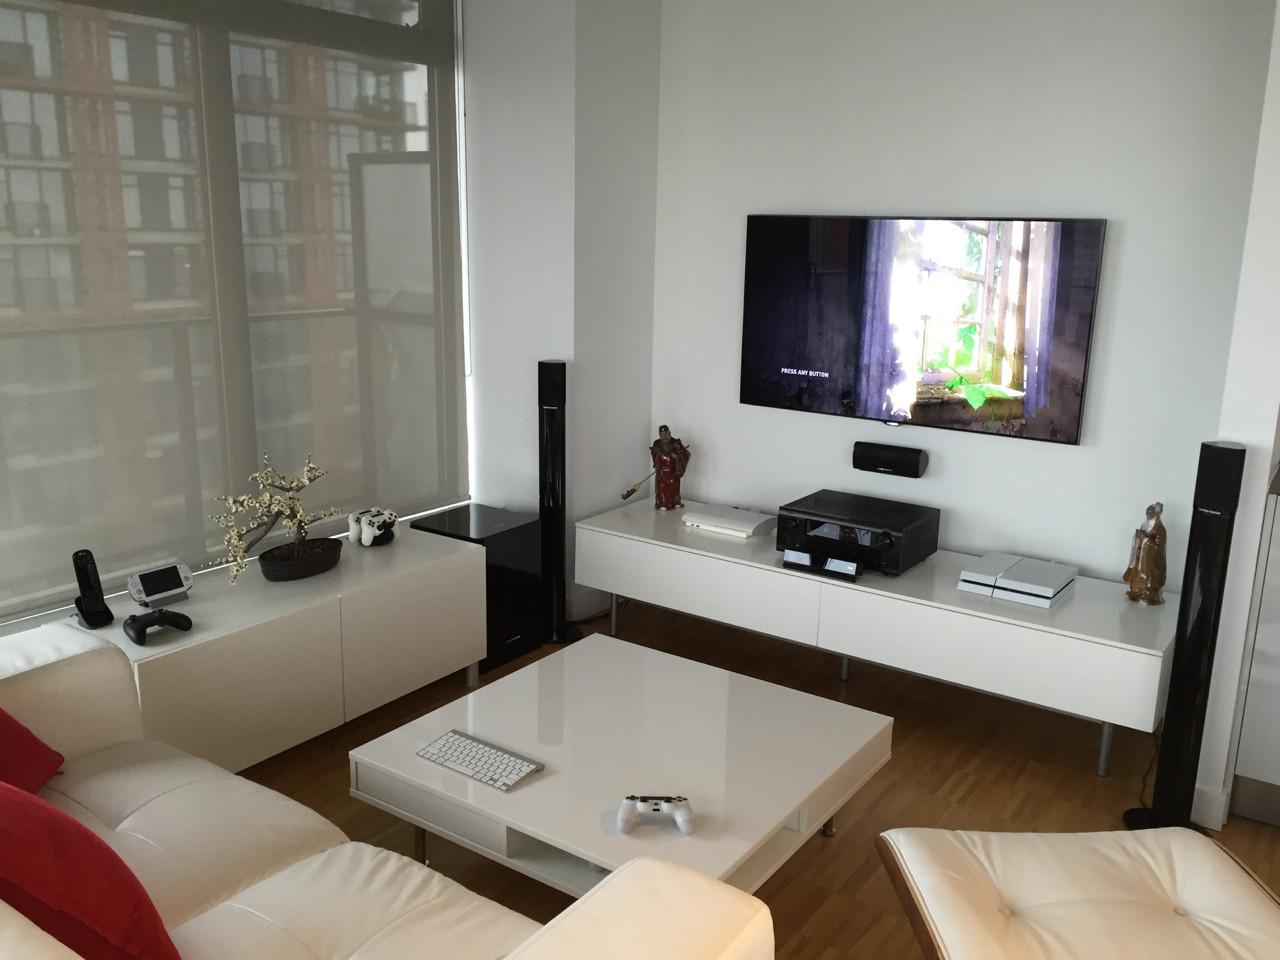 Xbox projector room decor